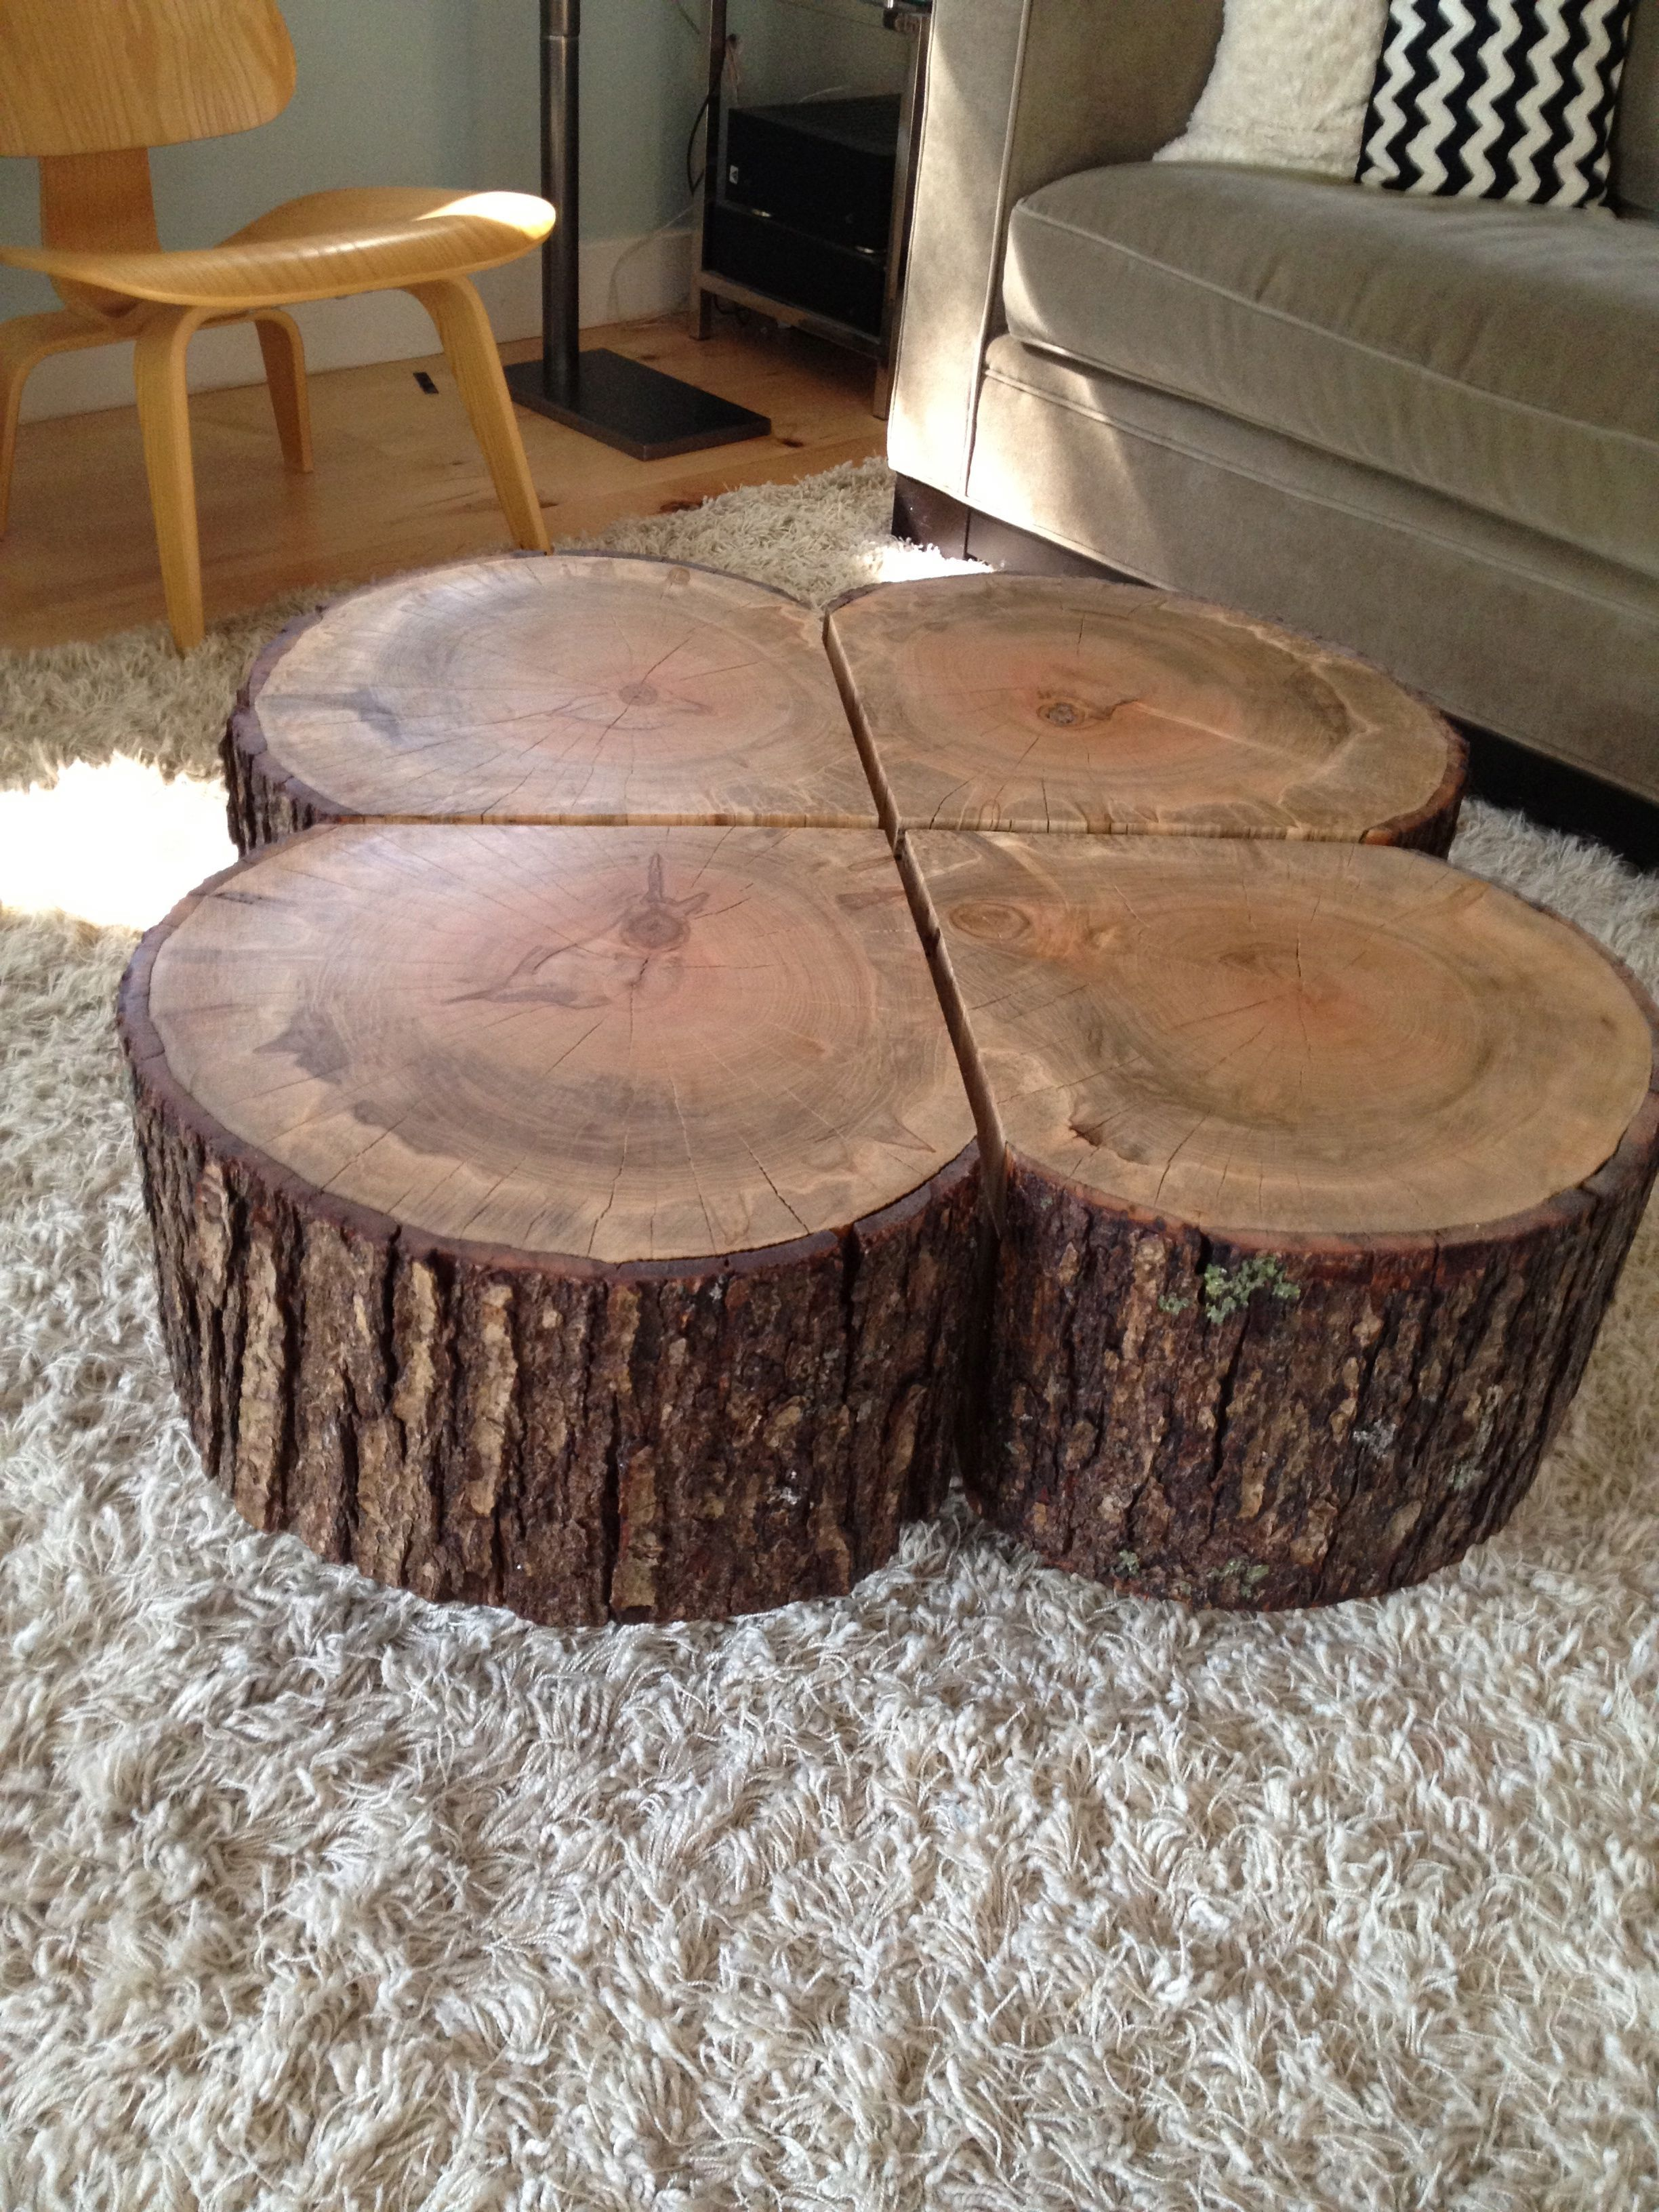 Shamrock Coffee Table On Wheels Wood Table Diy Rustic Wood Projects Rustic Log Furniture [ 3264 x 2448 Pixel ]